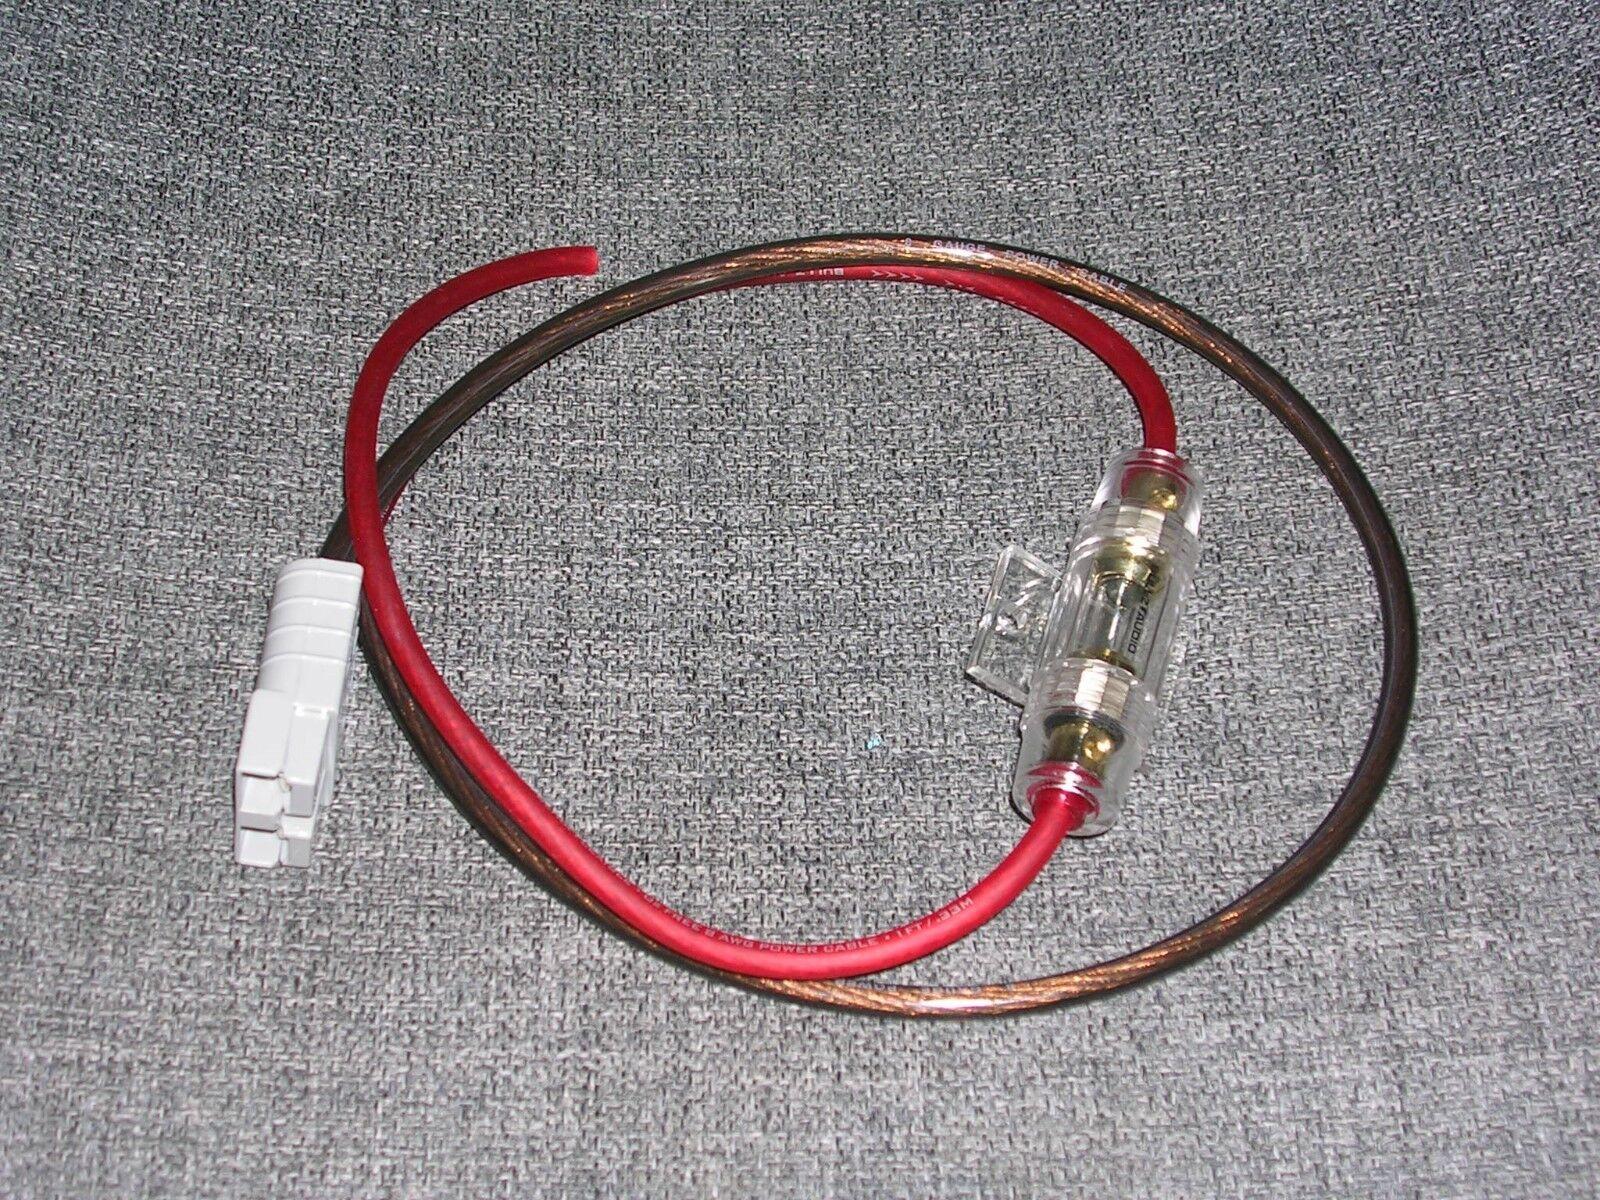 Ranger RCI-2950DX 2970DX 2995DX RHF-618 ECT  Frequency Expansion E-Key